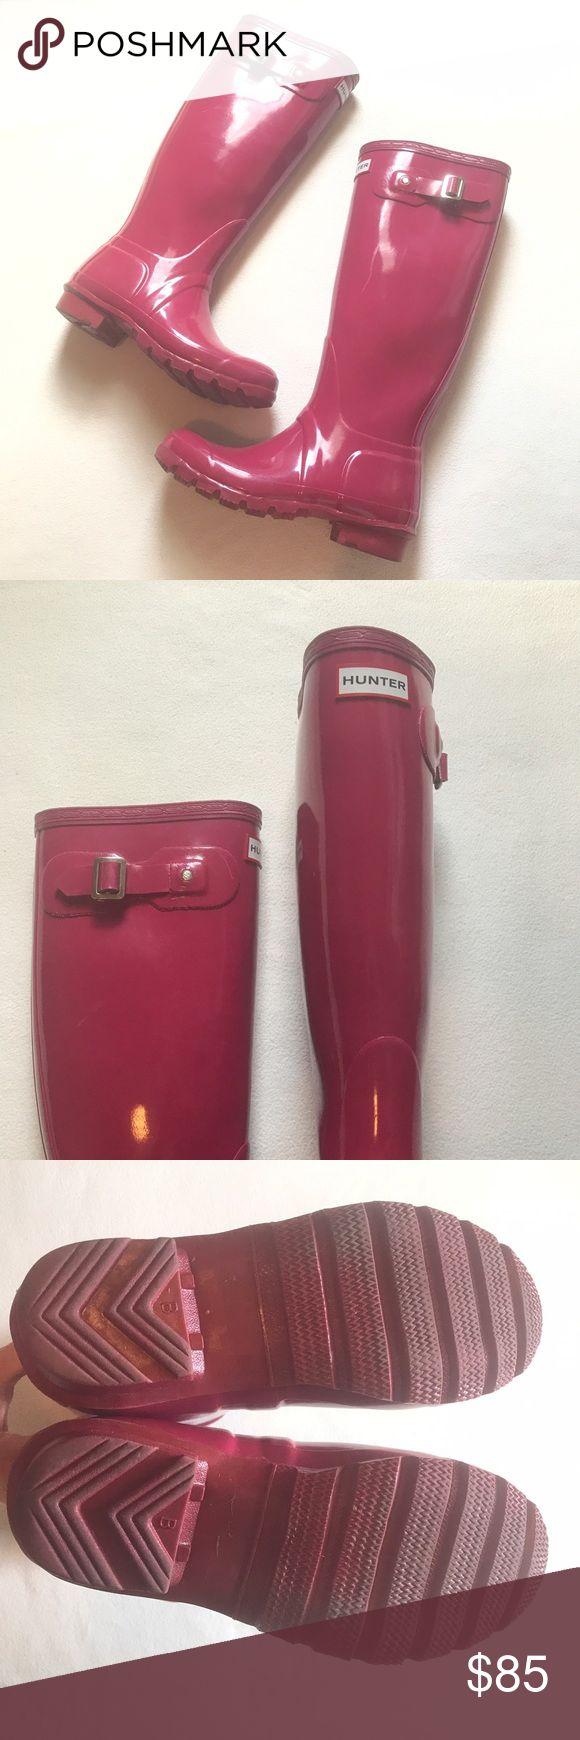 Raspberry High Gloss Tall Hunter Rain Boots Hunter. High gloss. Tall. Good condition. Very minimal signs of wear. Size US 4m/5f. UK 3. EU 35/36 Hunter Boots Shoes